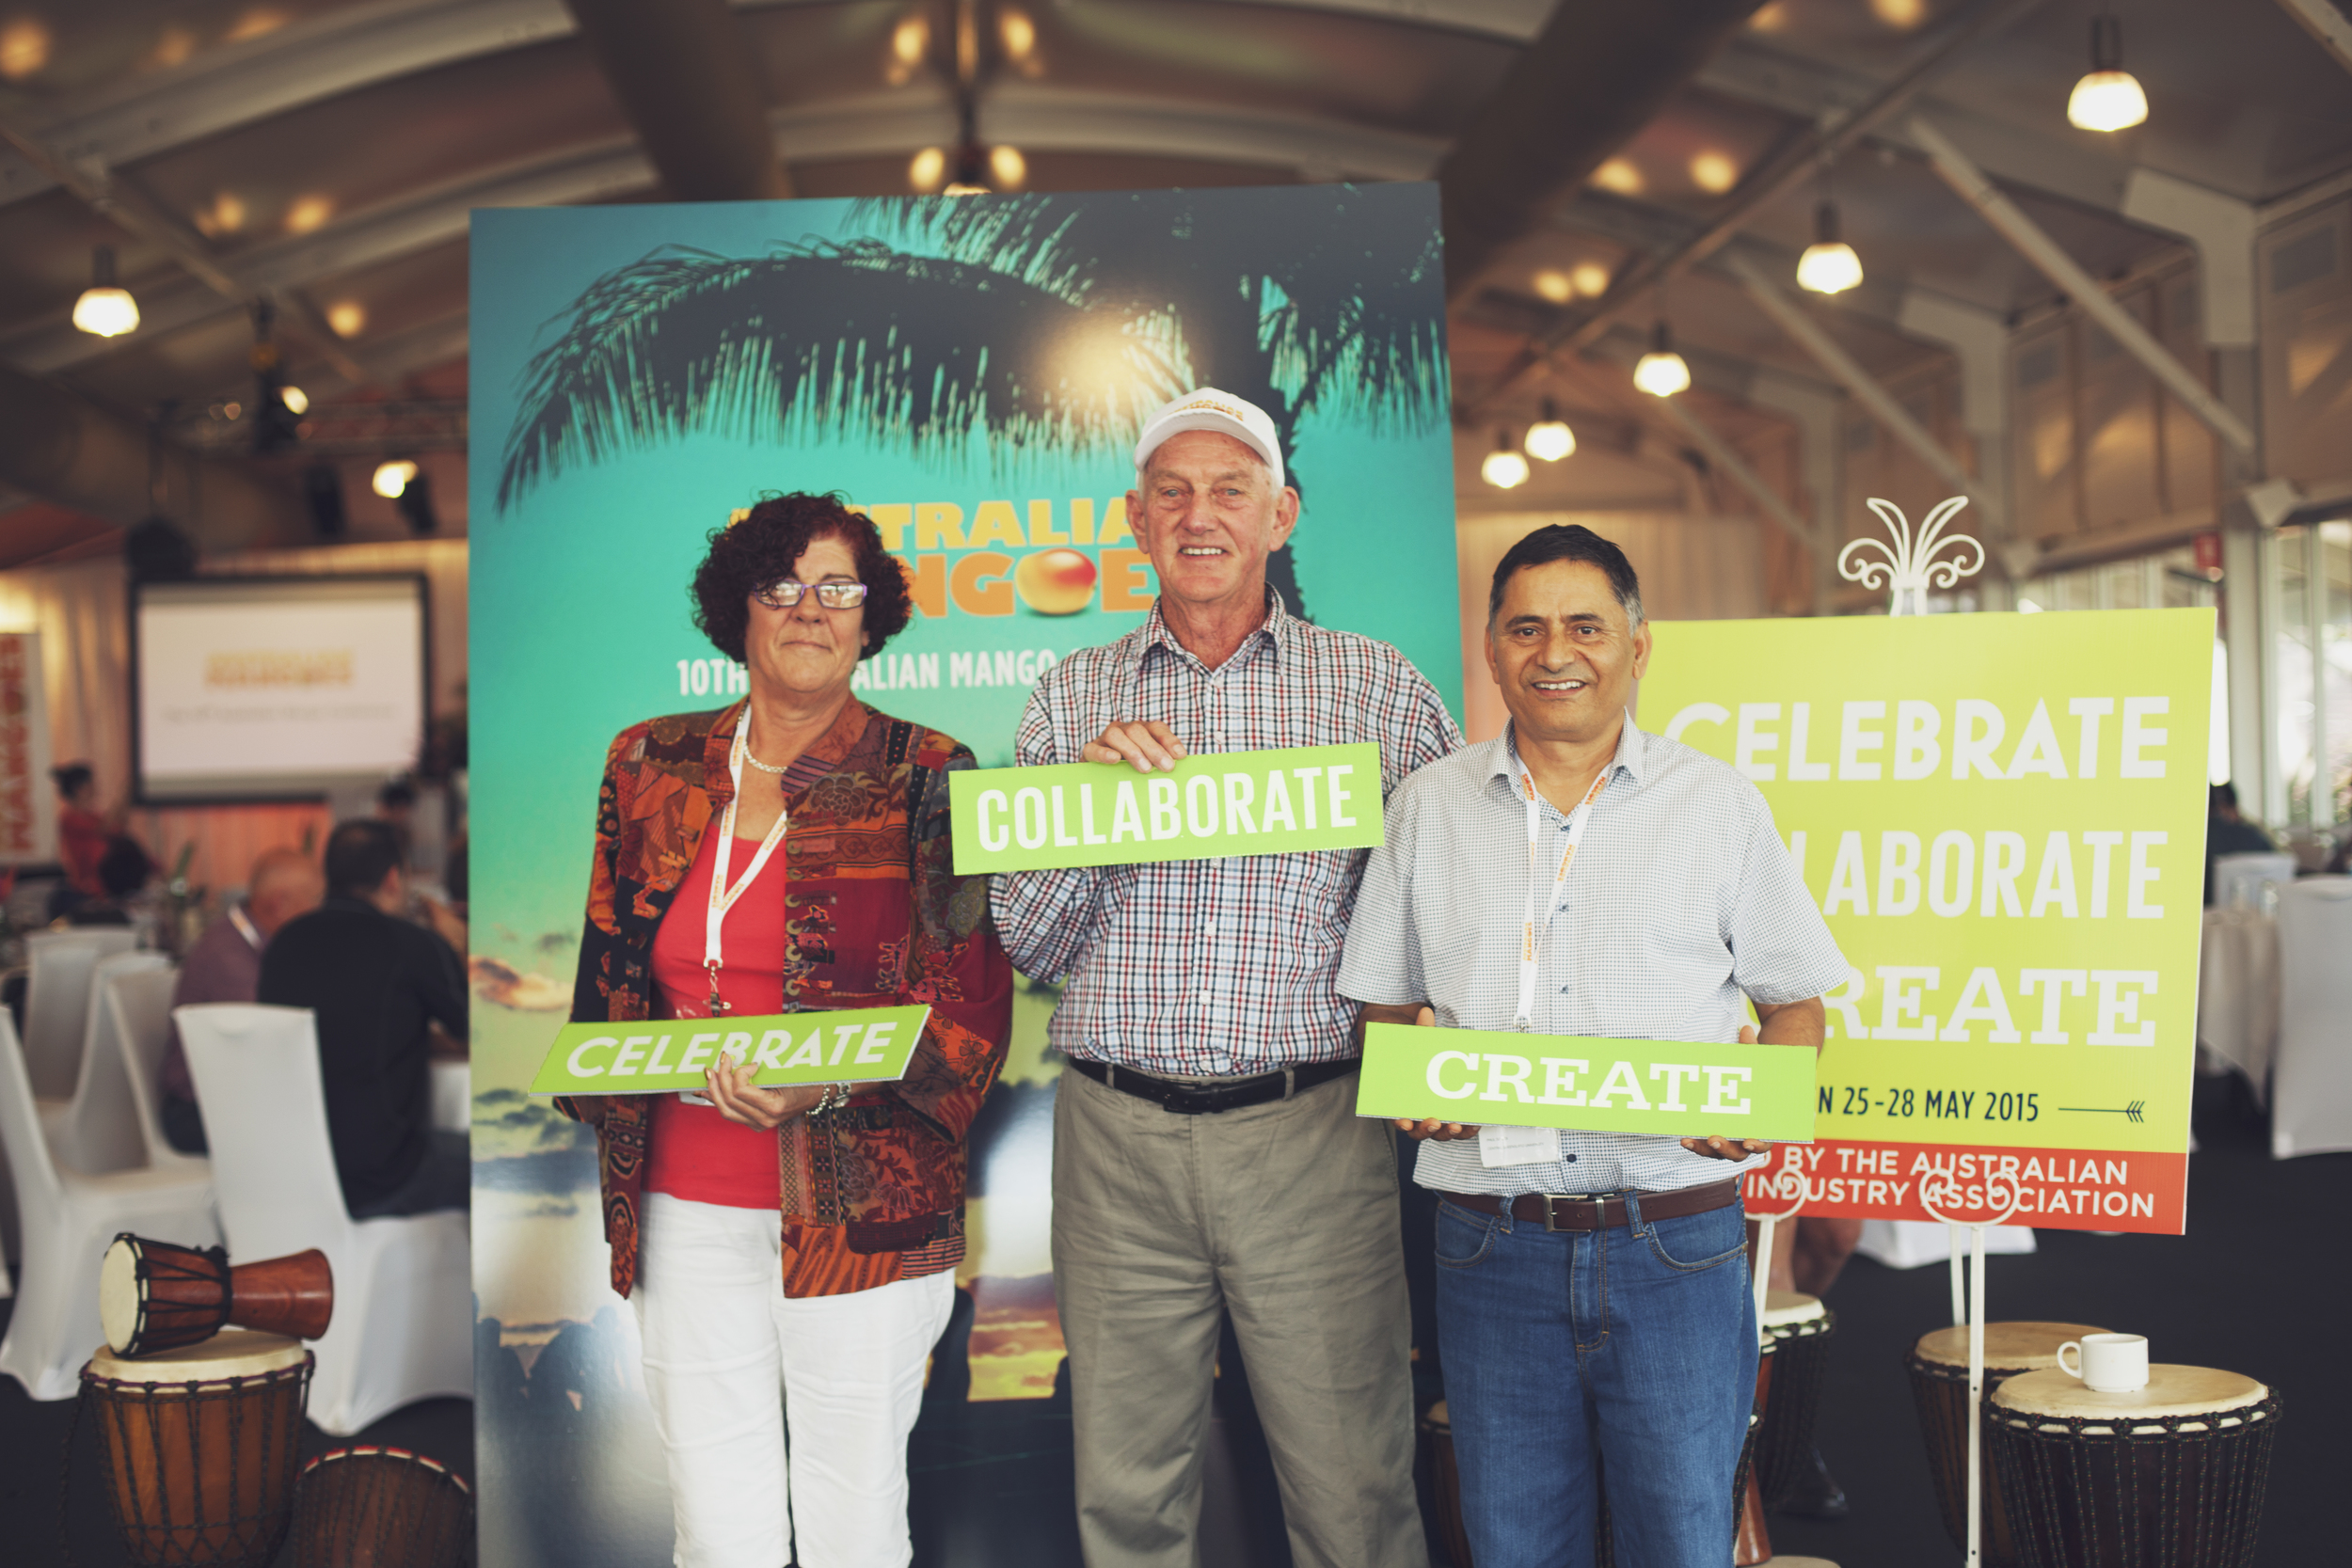 Kym Christiansen, Tom Gorton and Phul Subedi.jpg